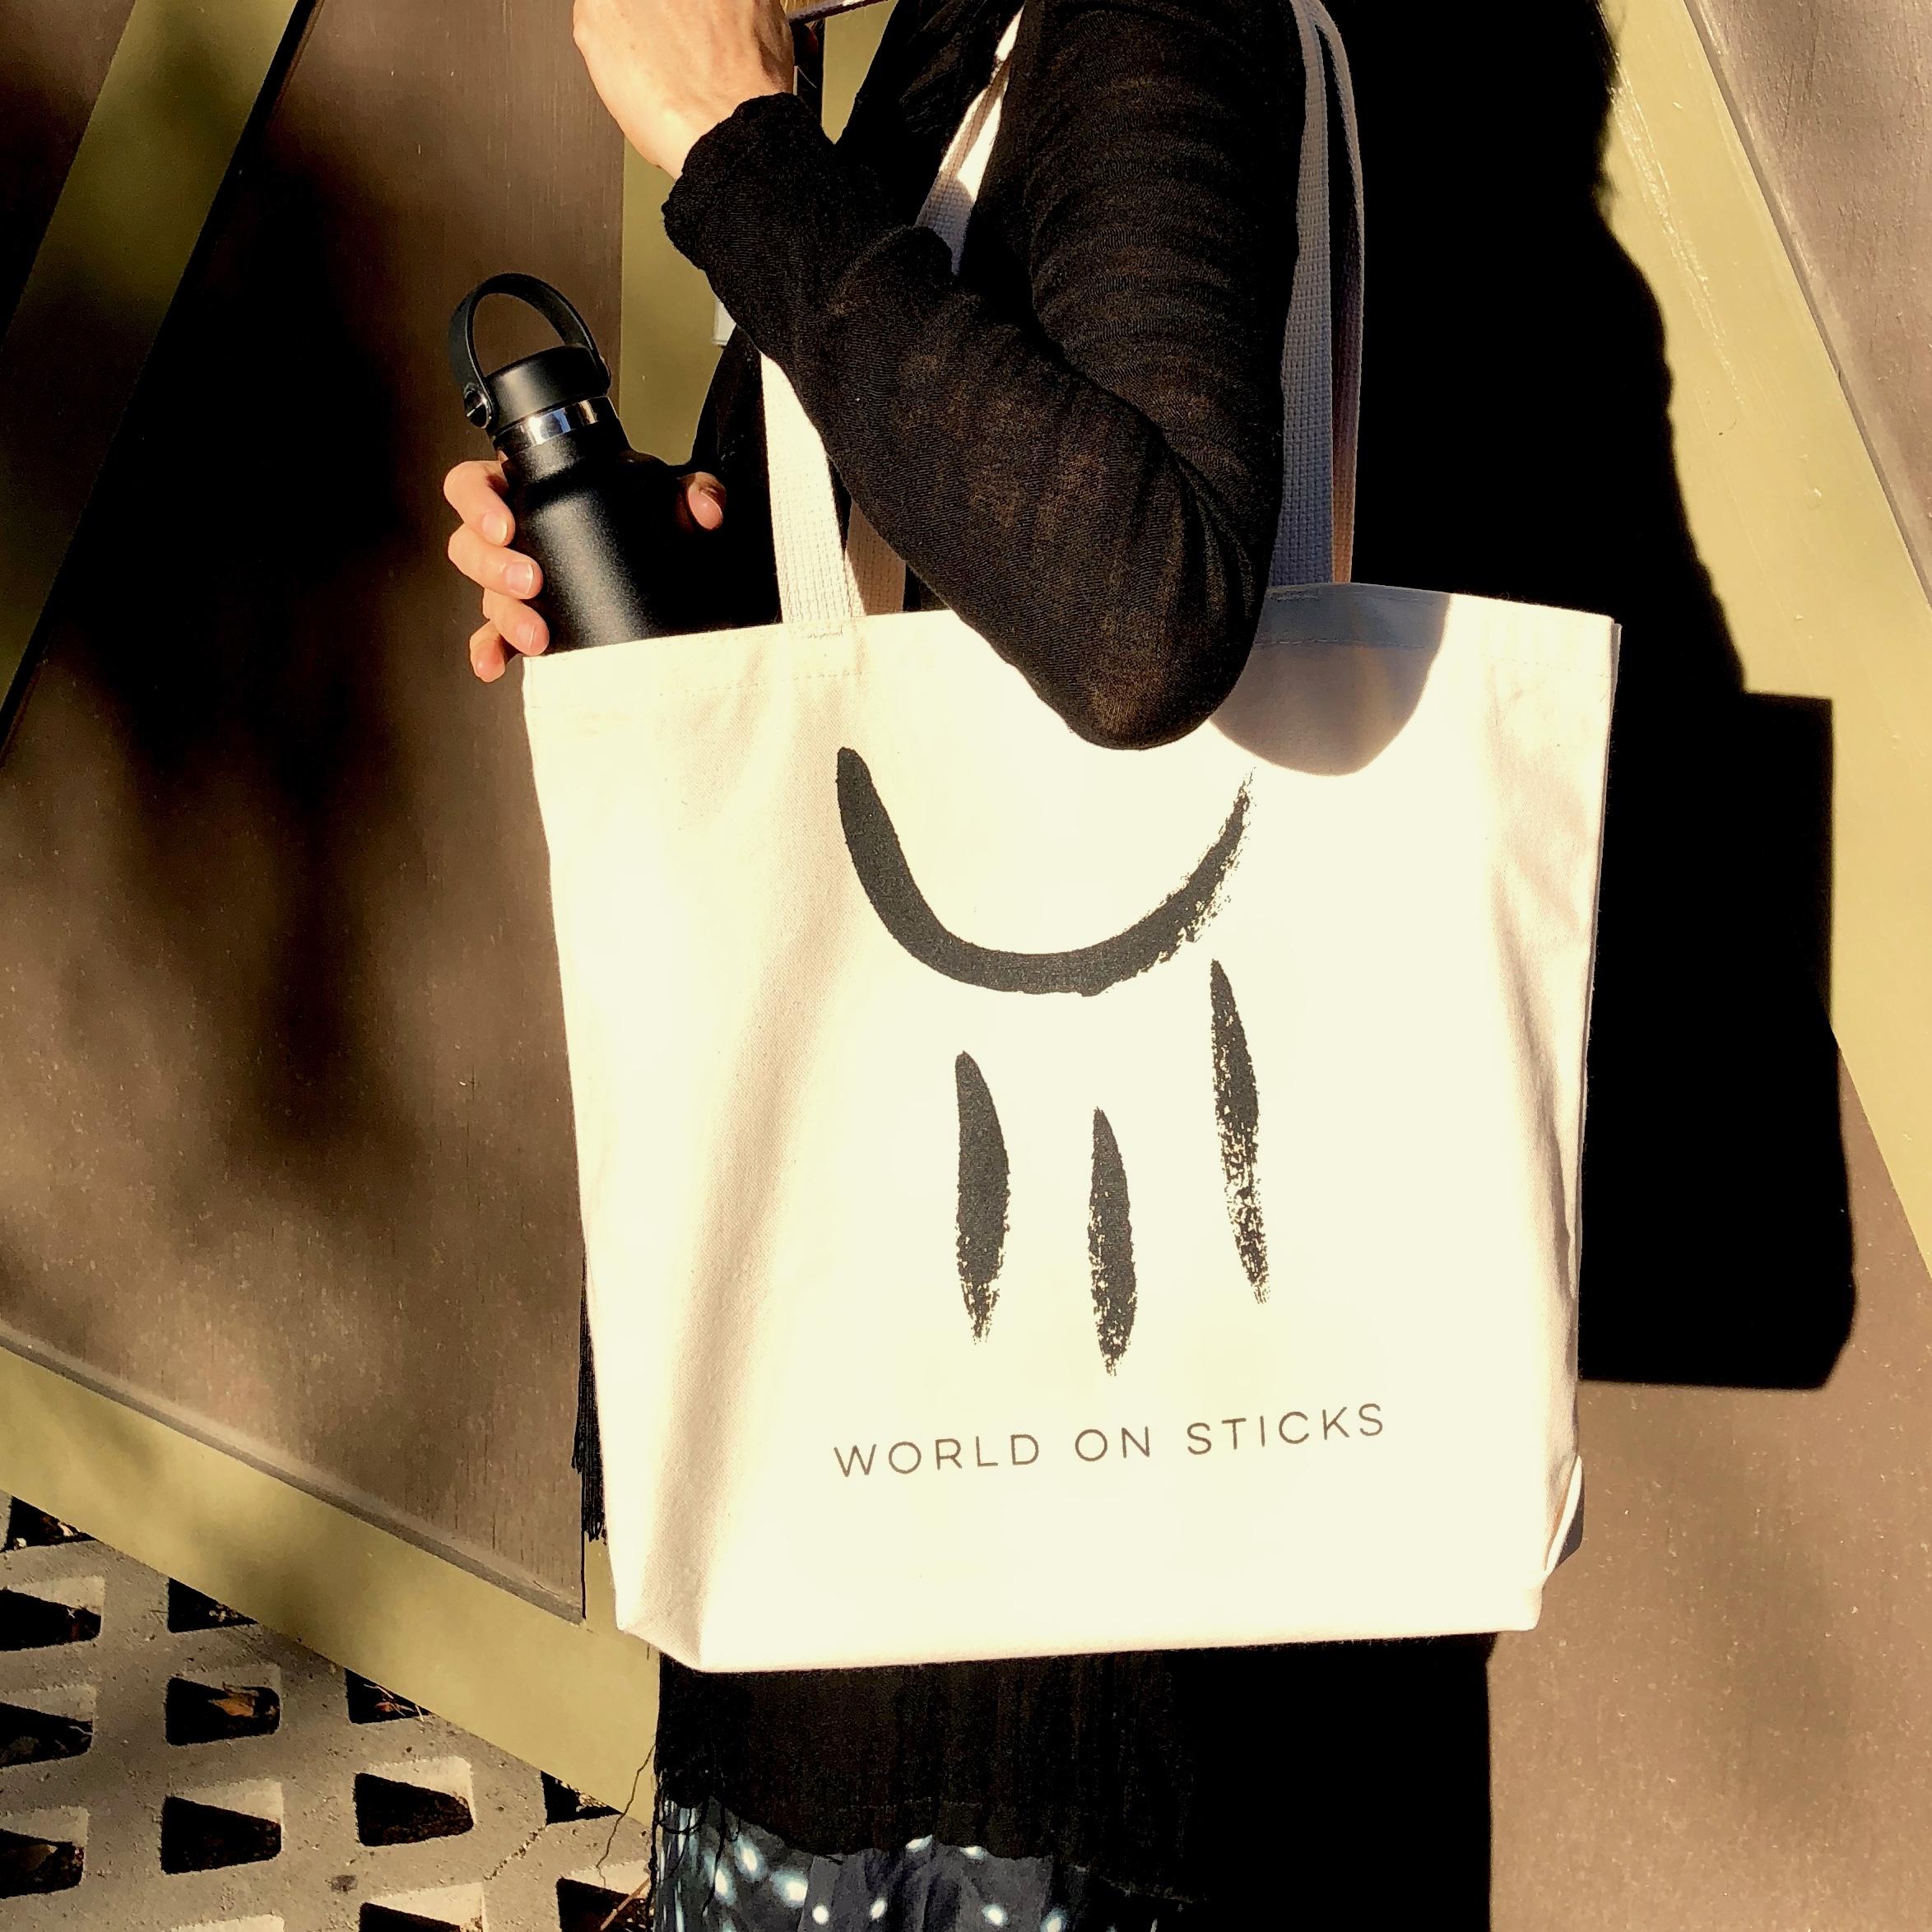 'WORLD ON STICKS' TOTE BAG - 100% ORGANIC COTTON - Sam Phillips